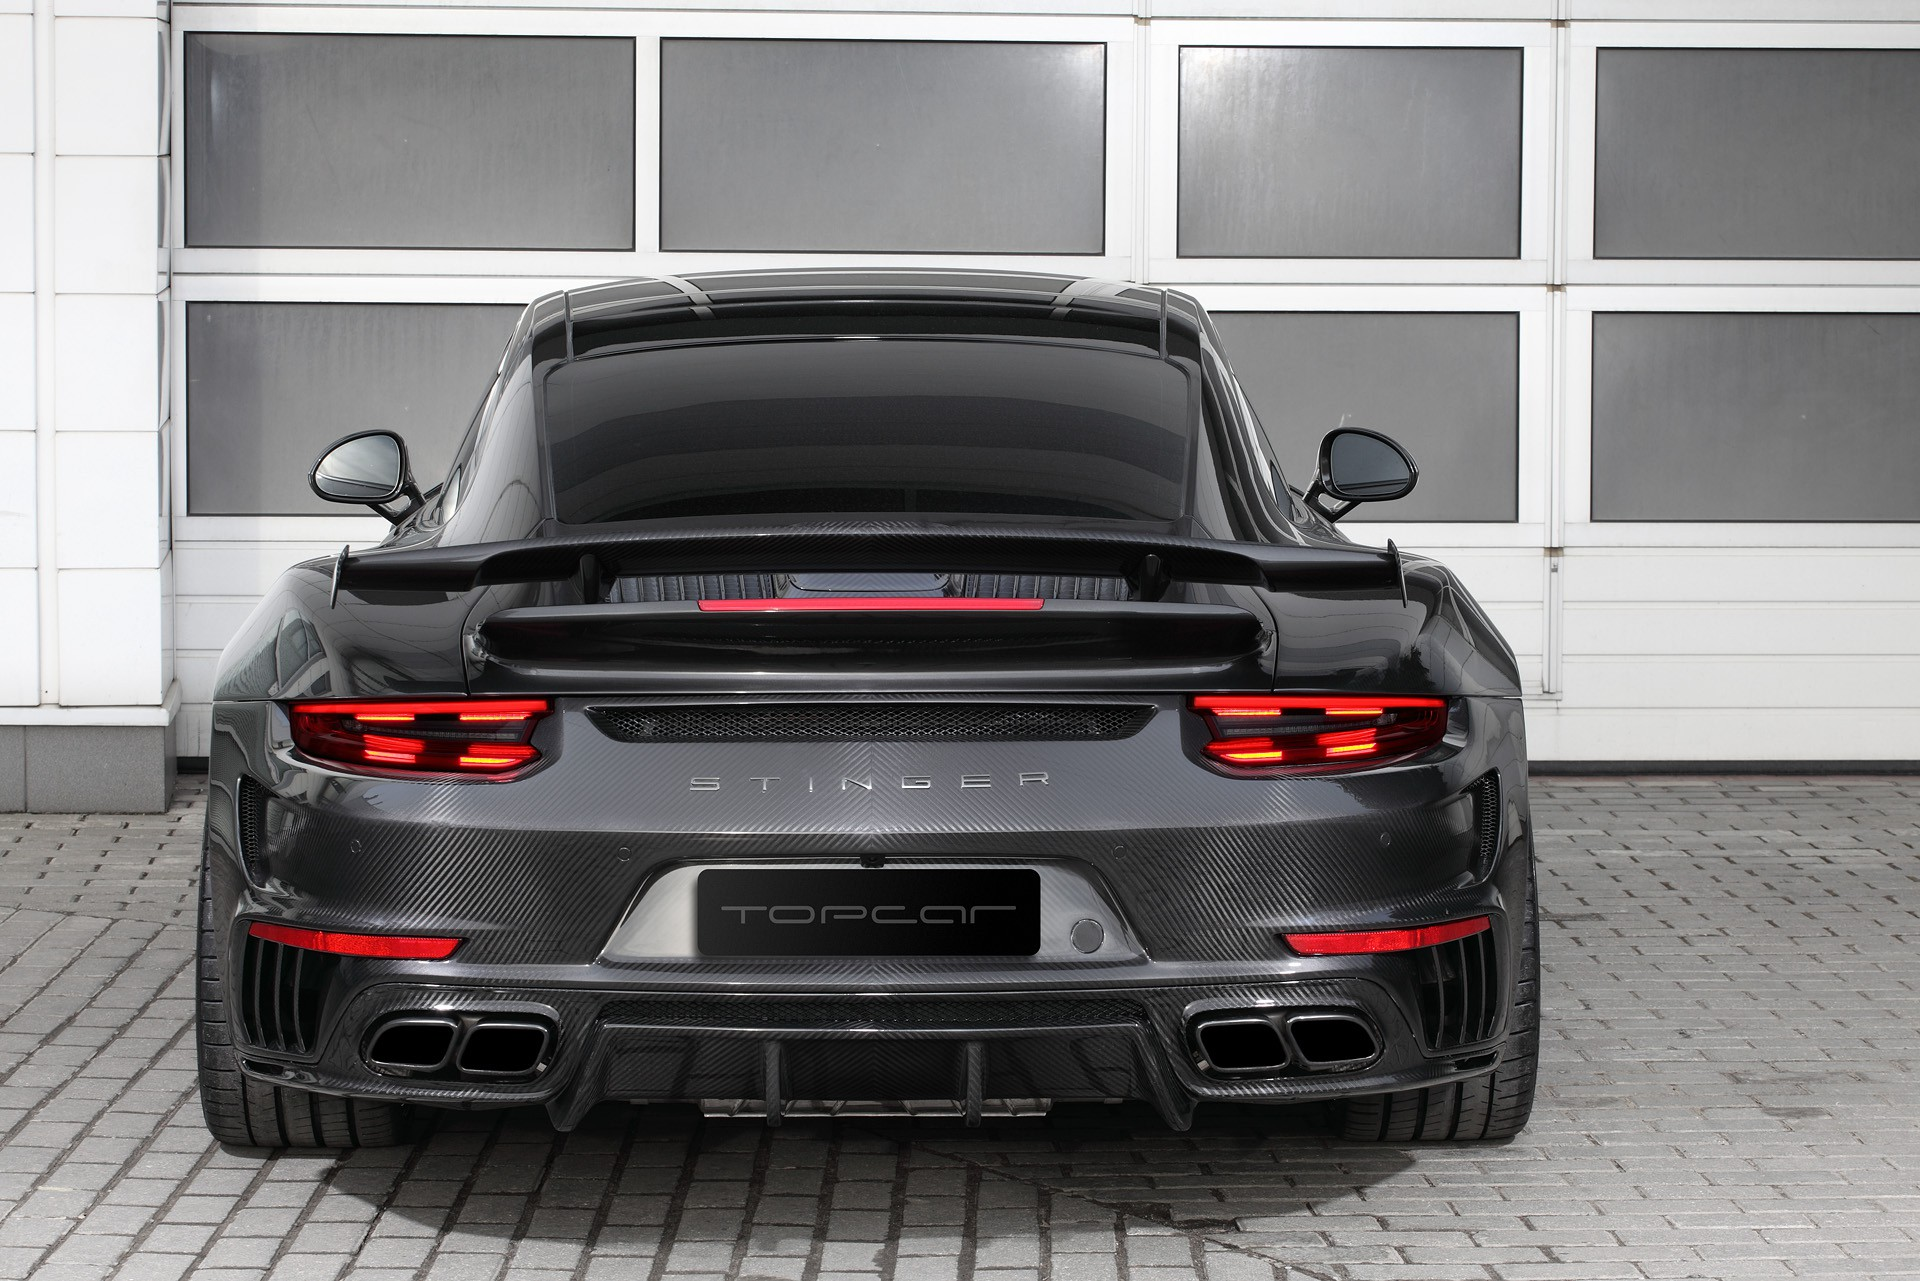 Topcar 911 Type 991 Turbo Stinger GTR Carbon - 2017 - rear